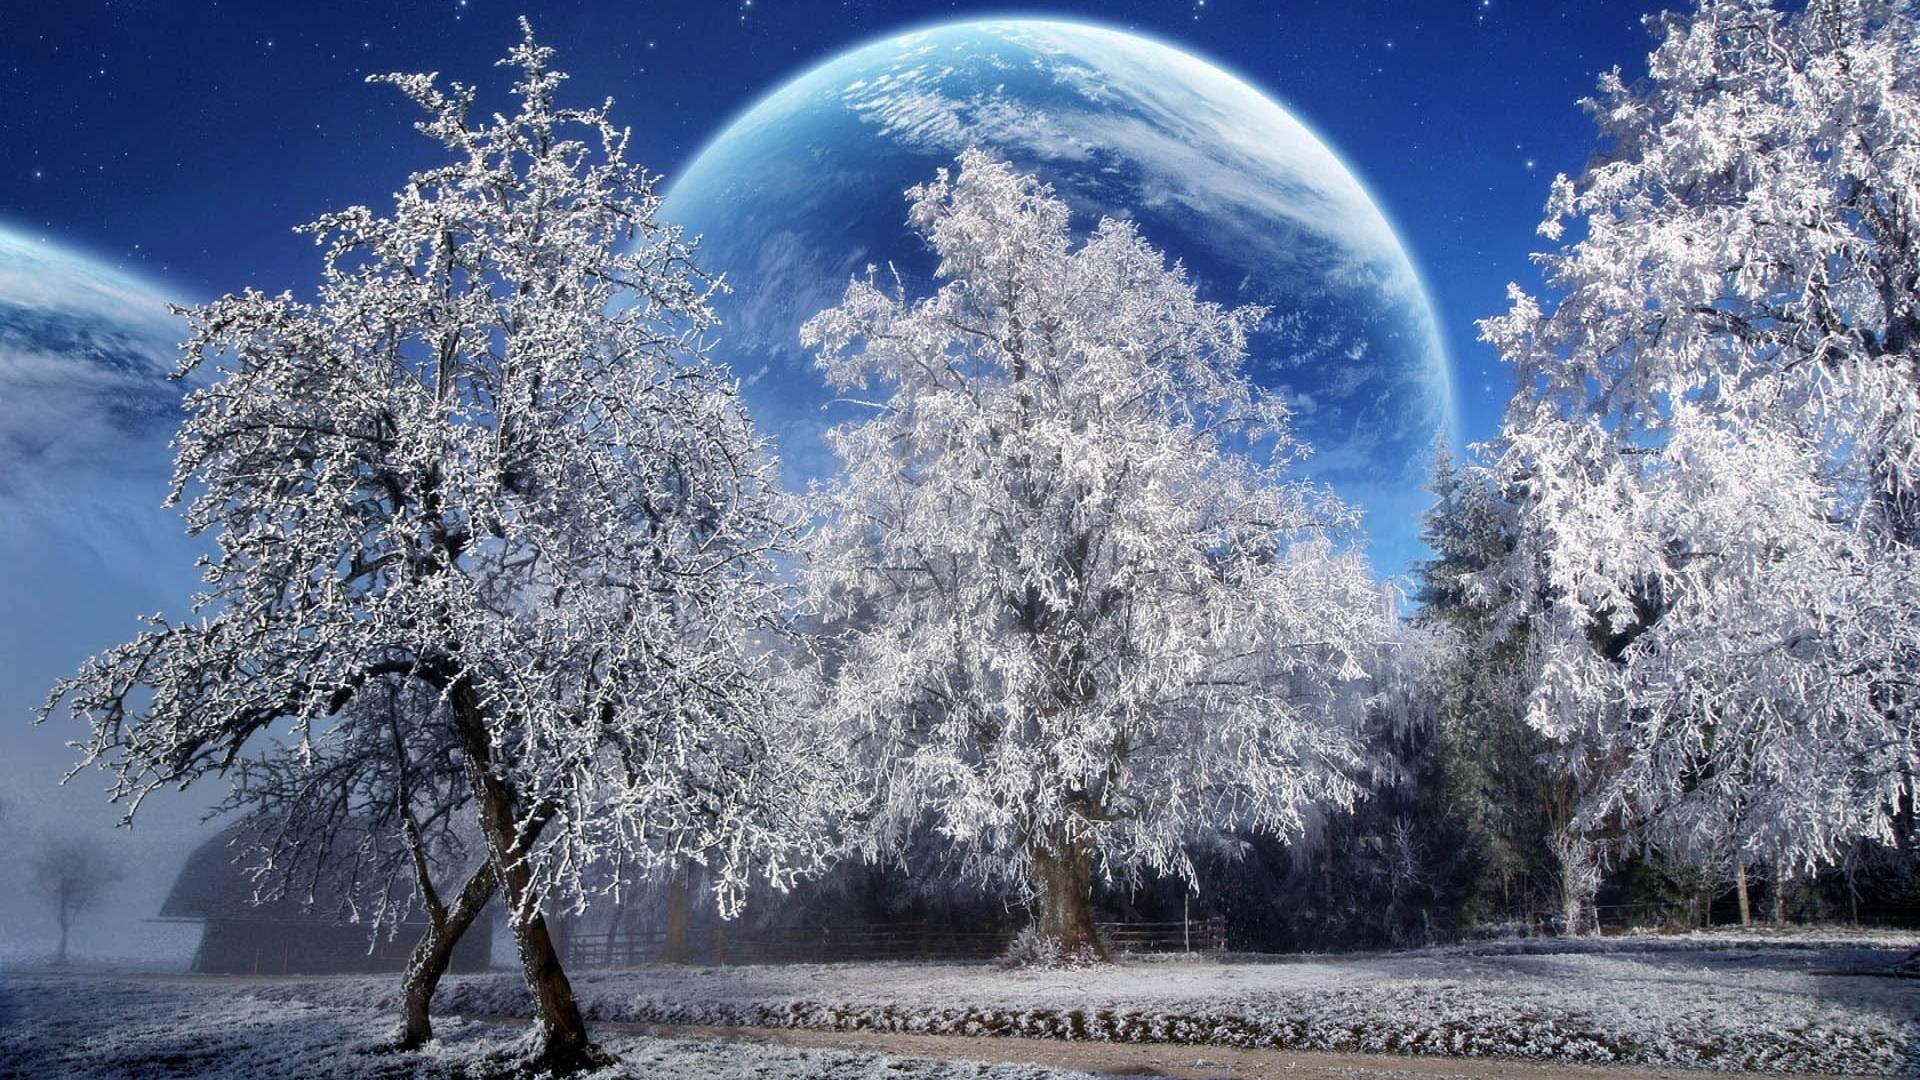 beautiful_winter_wallpapers_for_desktop (10) – Boomwallpaper.com .